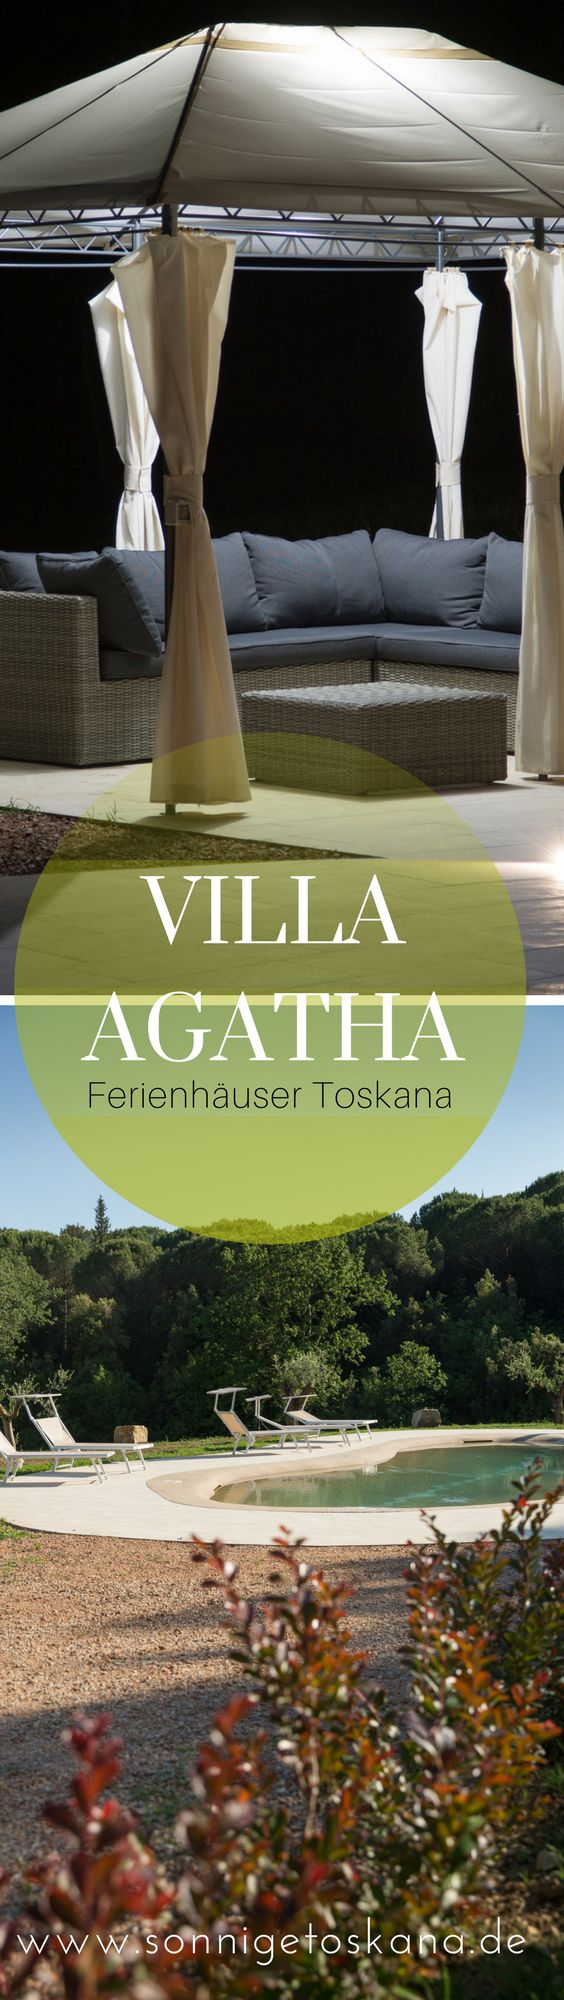 Villa Agatha - Ferienhaus in der Toskana - Italien, Toskana, 6 Schlafzimmer, Klima, Jacuzzi, Privater Pool, Küstennähe #reisen #toskana #toskanavillas #villaagatha #sonnigetoskana